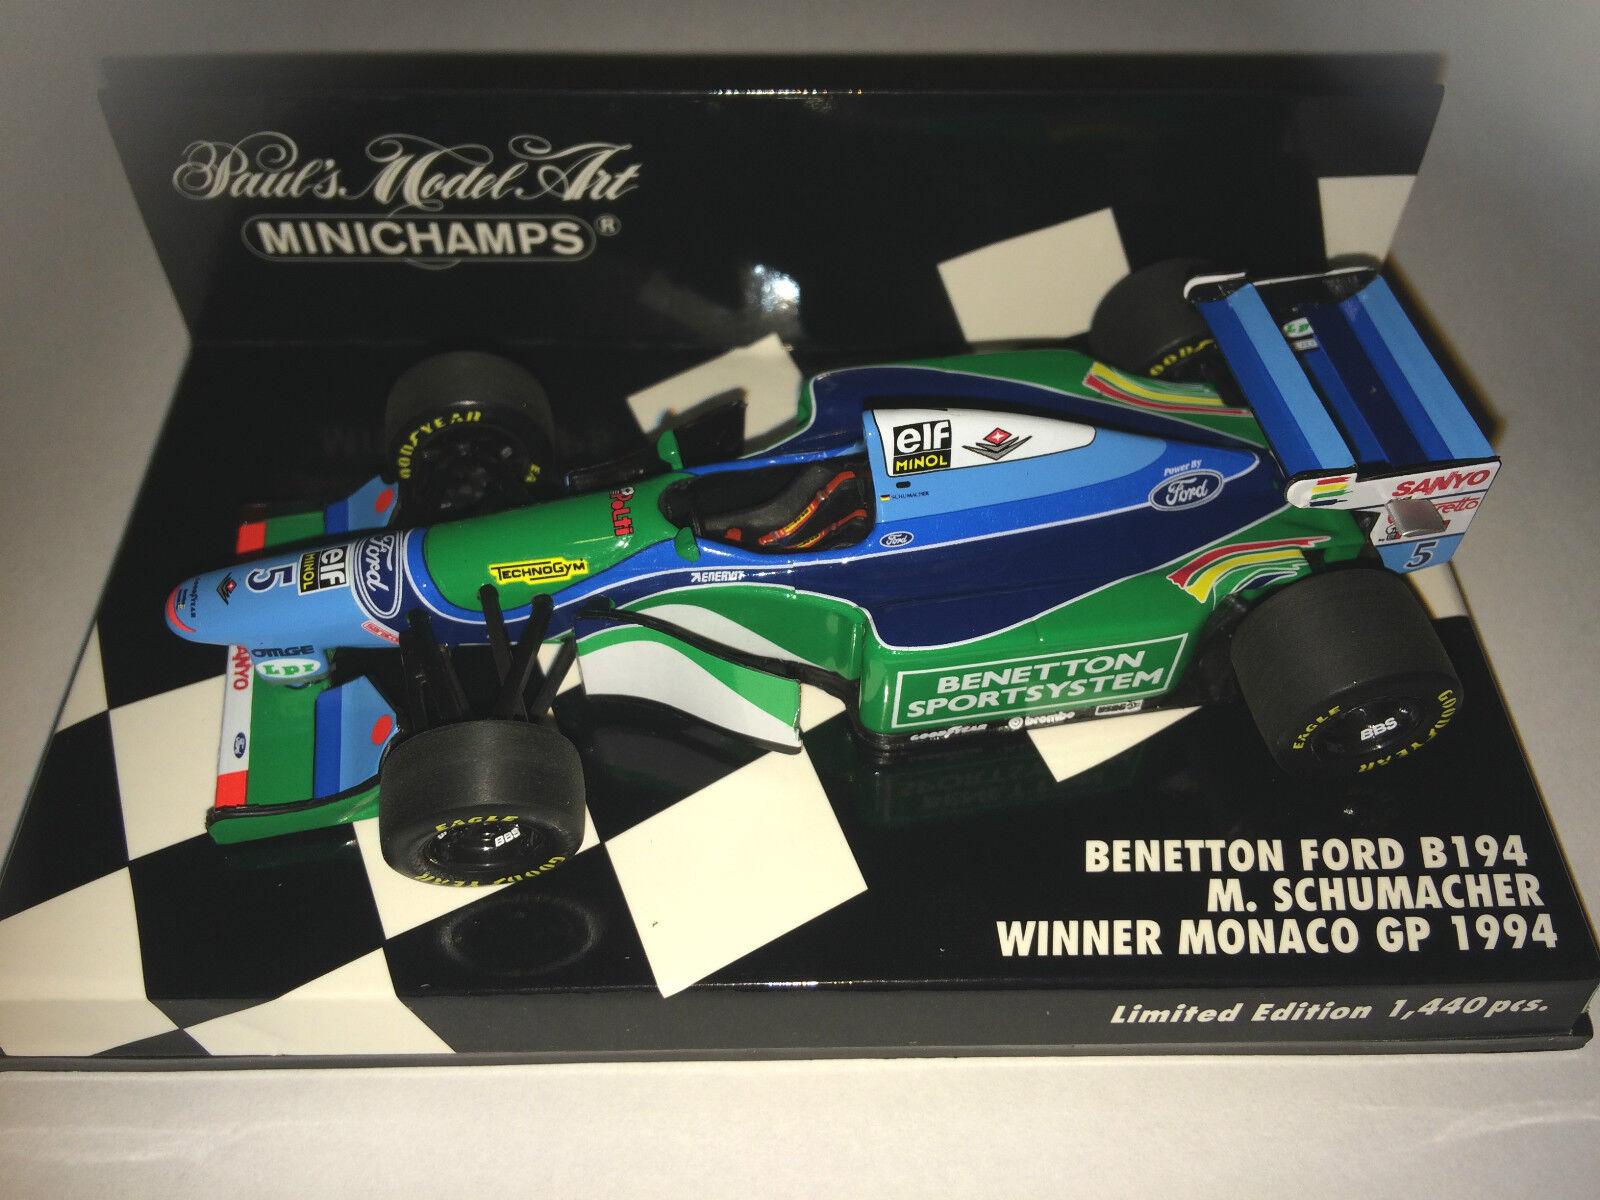 Minichamps F1 1 43 BENETTON FORD B194 - Schumacher - WINNER MONACO GP 1440 pcs